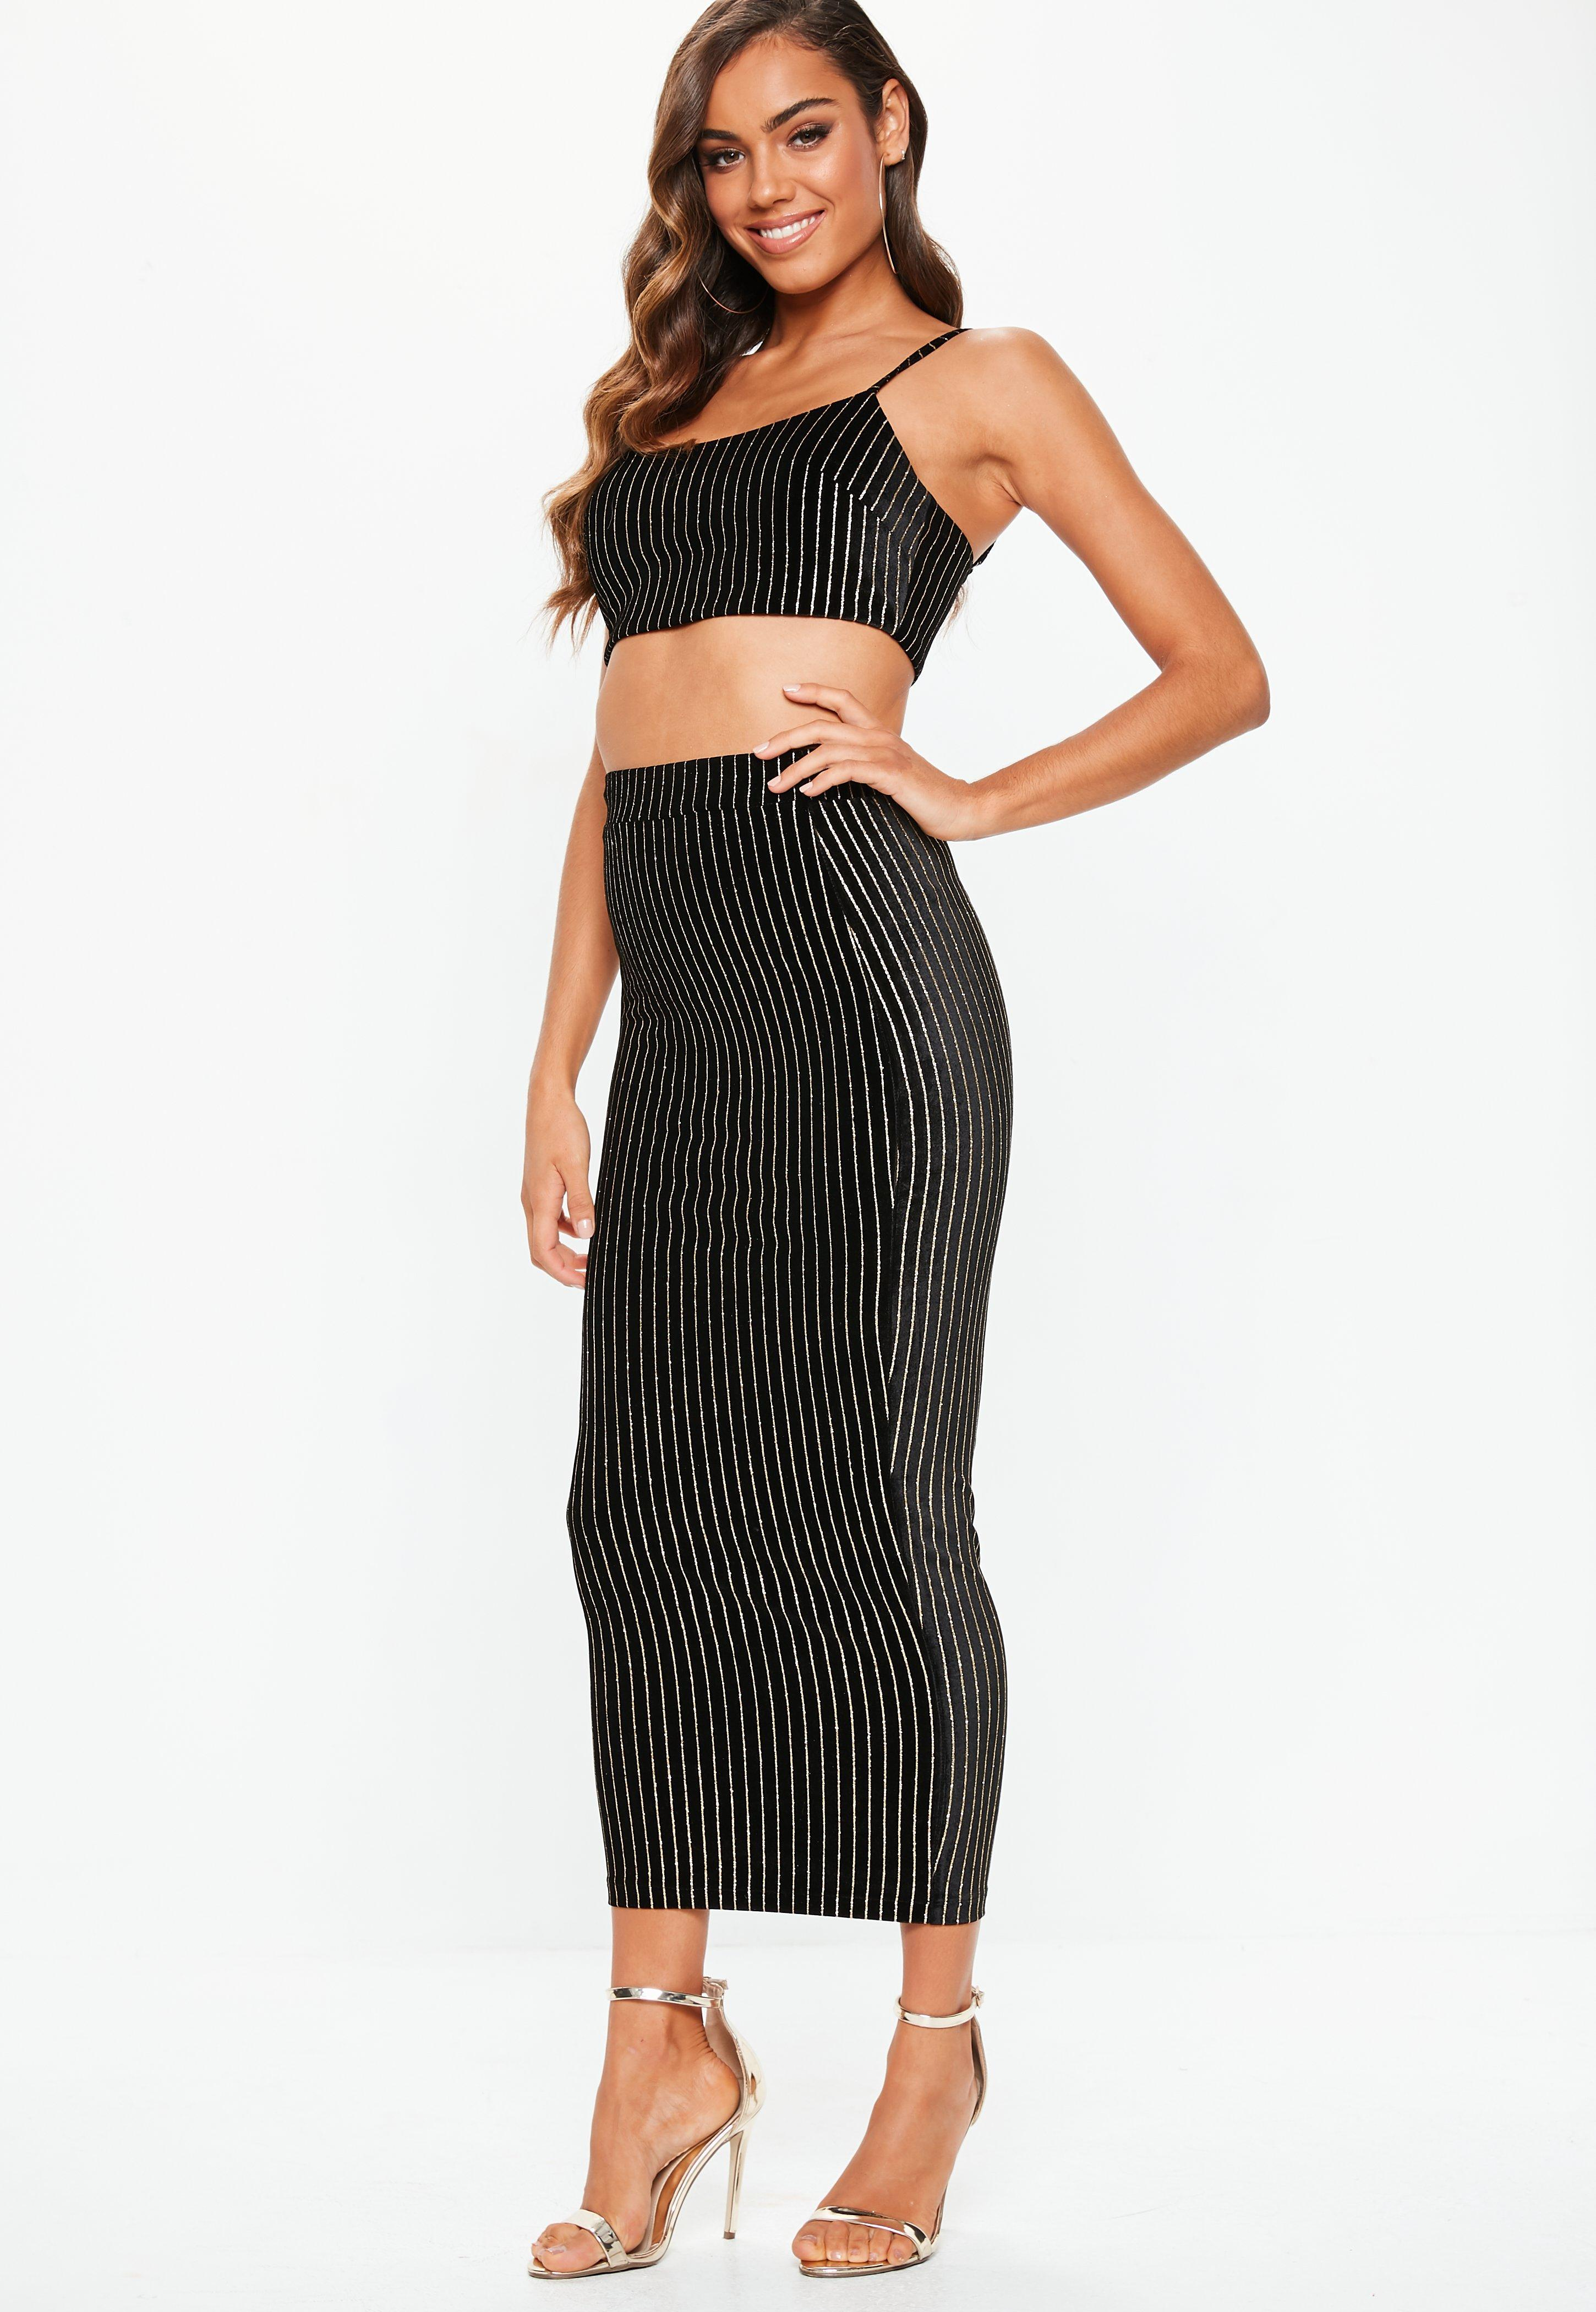 487ec3645edc92 Lyst - Missguided Black Velvet Glitter Stripe Cami Crop And Midi Co ...